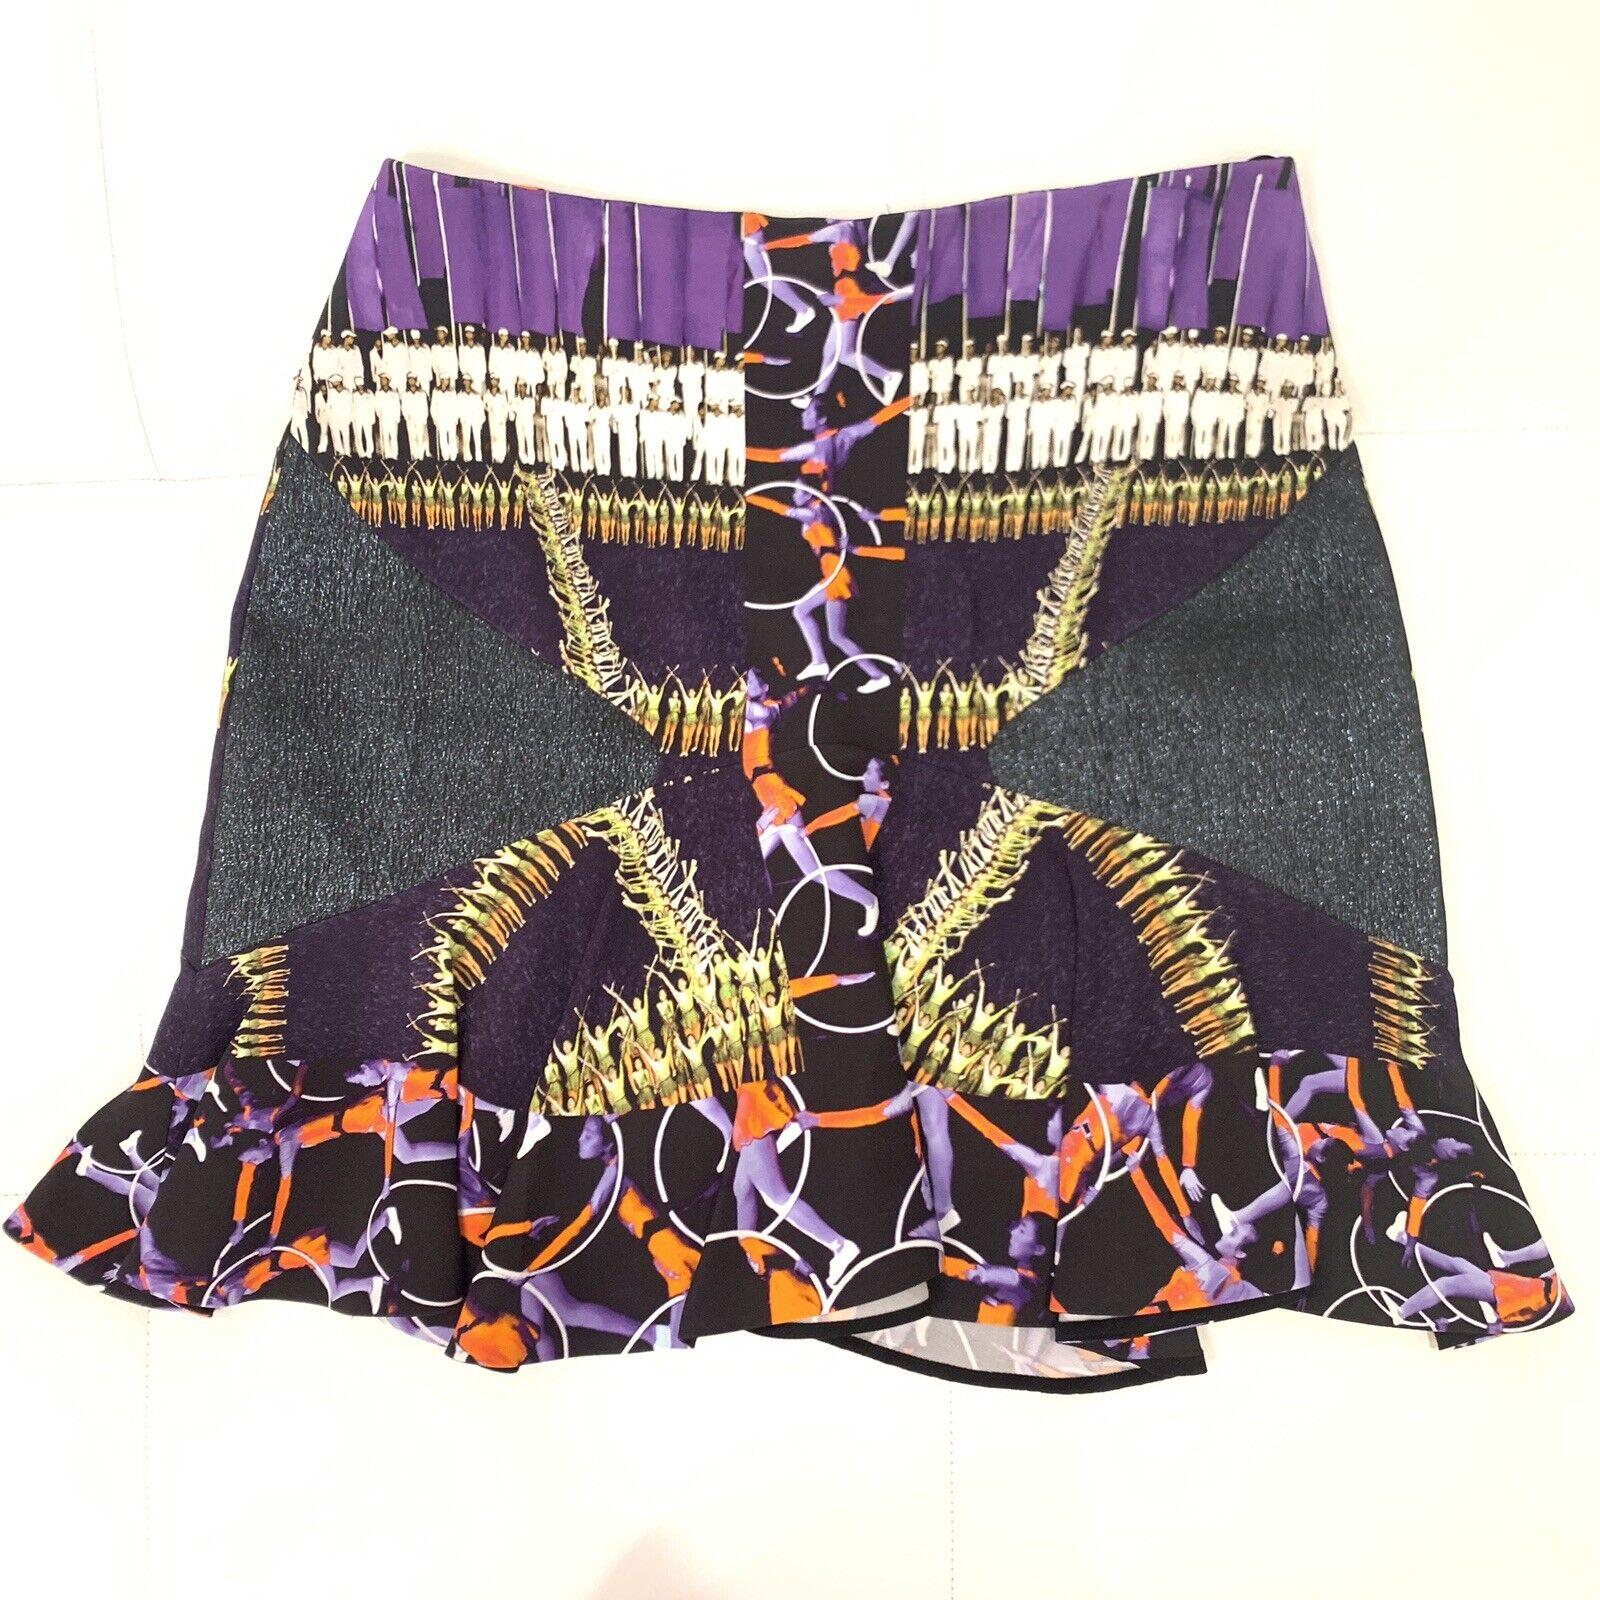 Peter Pilotto Multi Color blancoo Negro Púrpura con  cintura alta falda de volantes talla 42  en linea